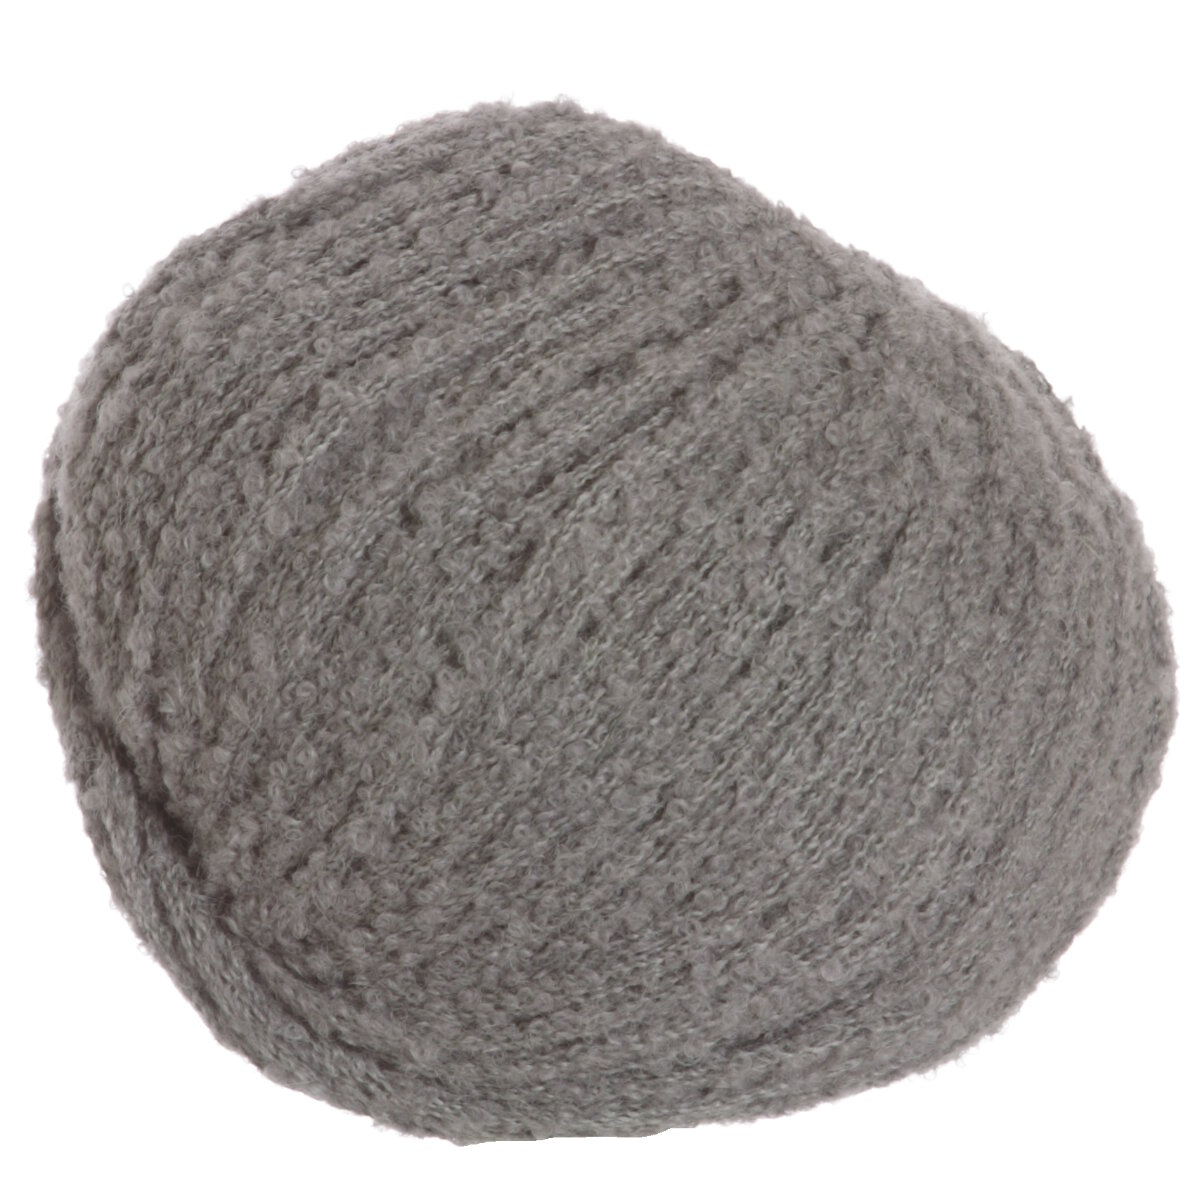 Knitting Patterns Boucle Wool : Plymouth Arequipa Boucle Yarn at Jimmy Beans Wool